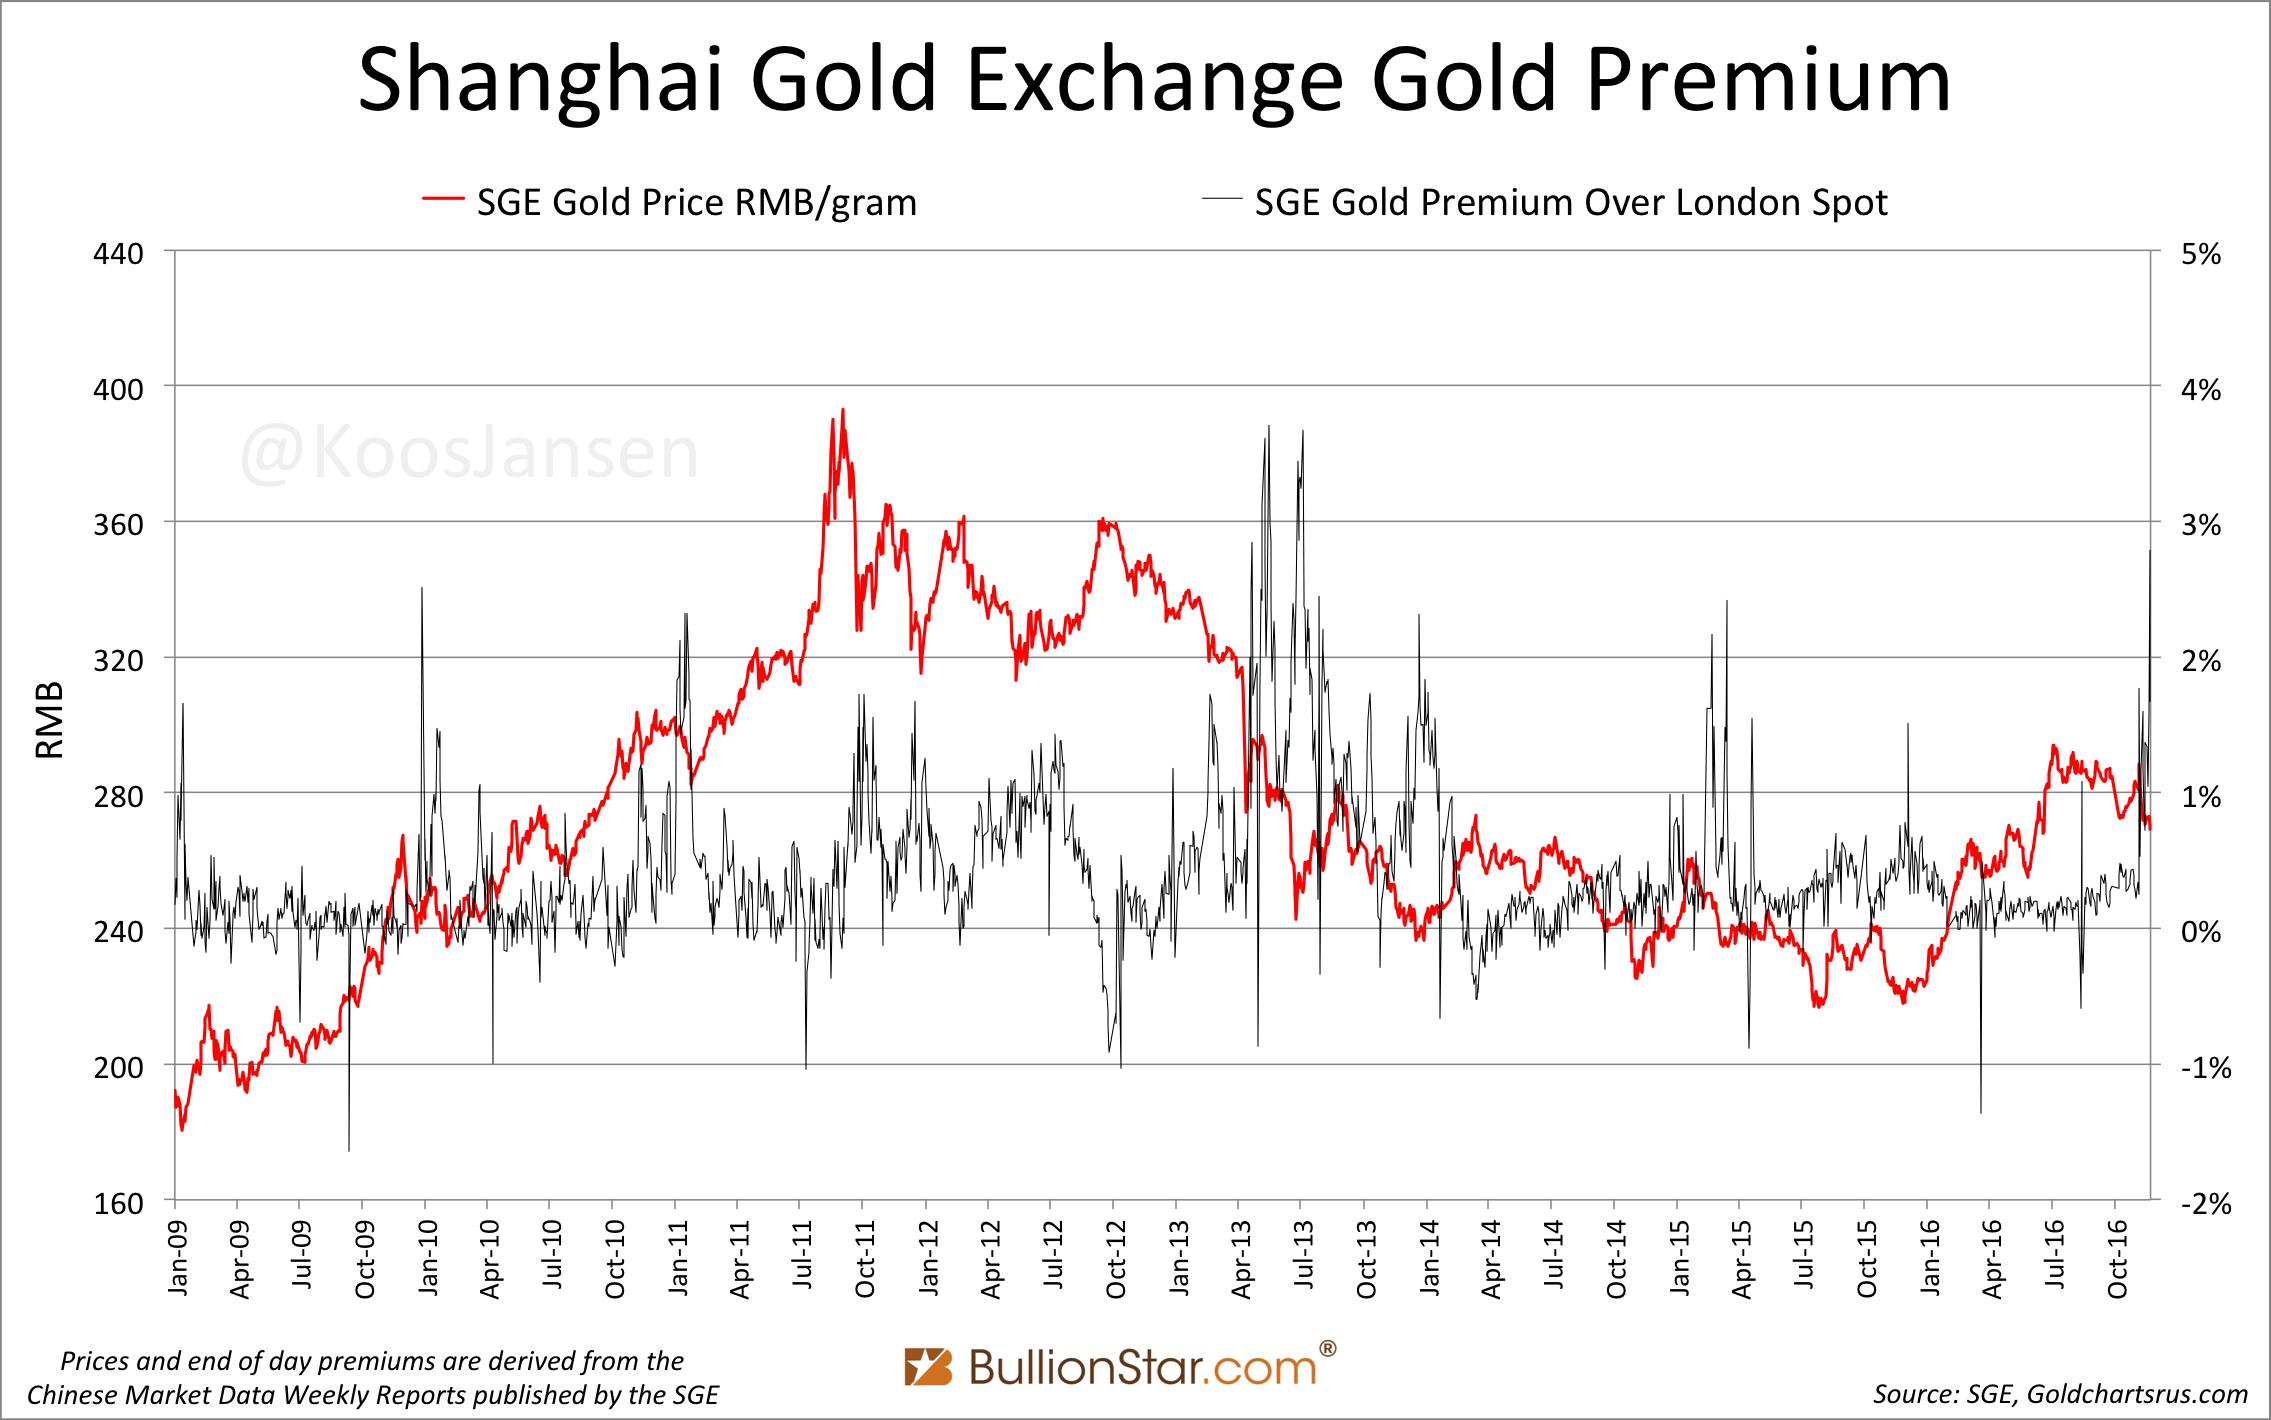 Shanghai Gold Exchange Sge Premium 2009 Novemner